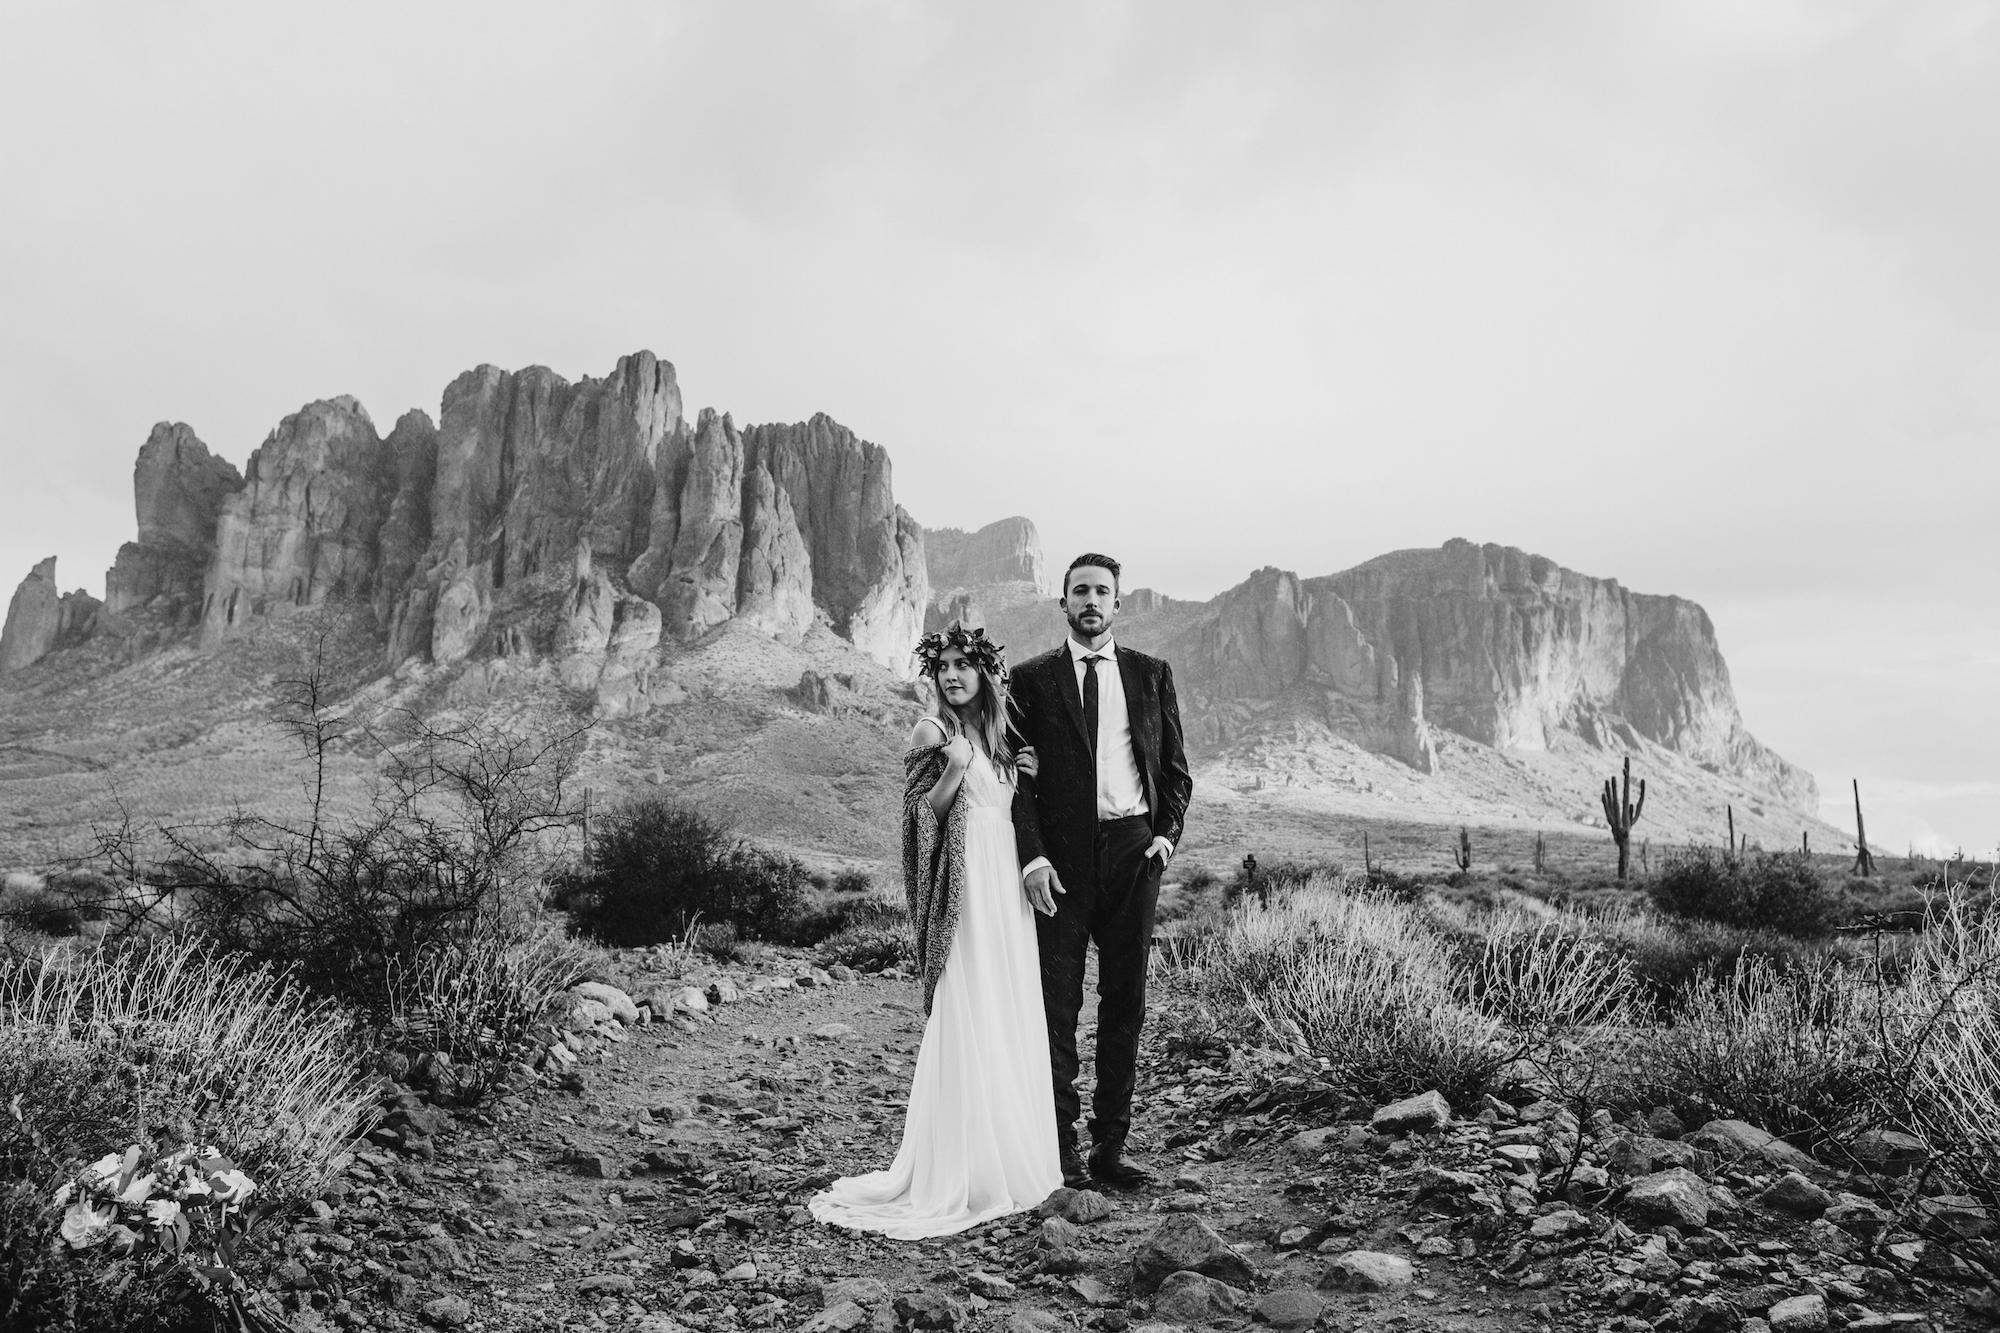 arizona - wedding - photographer772.jpg